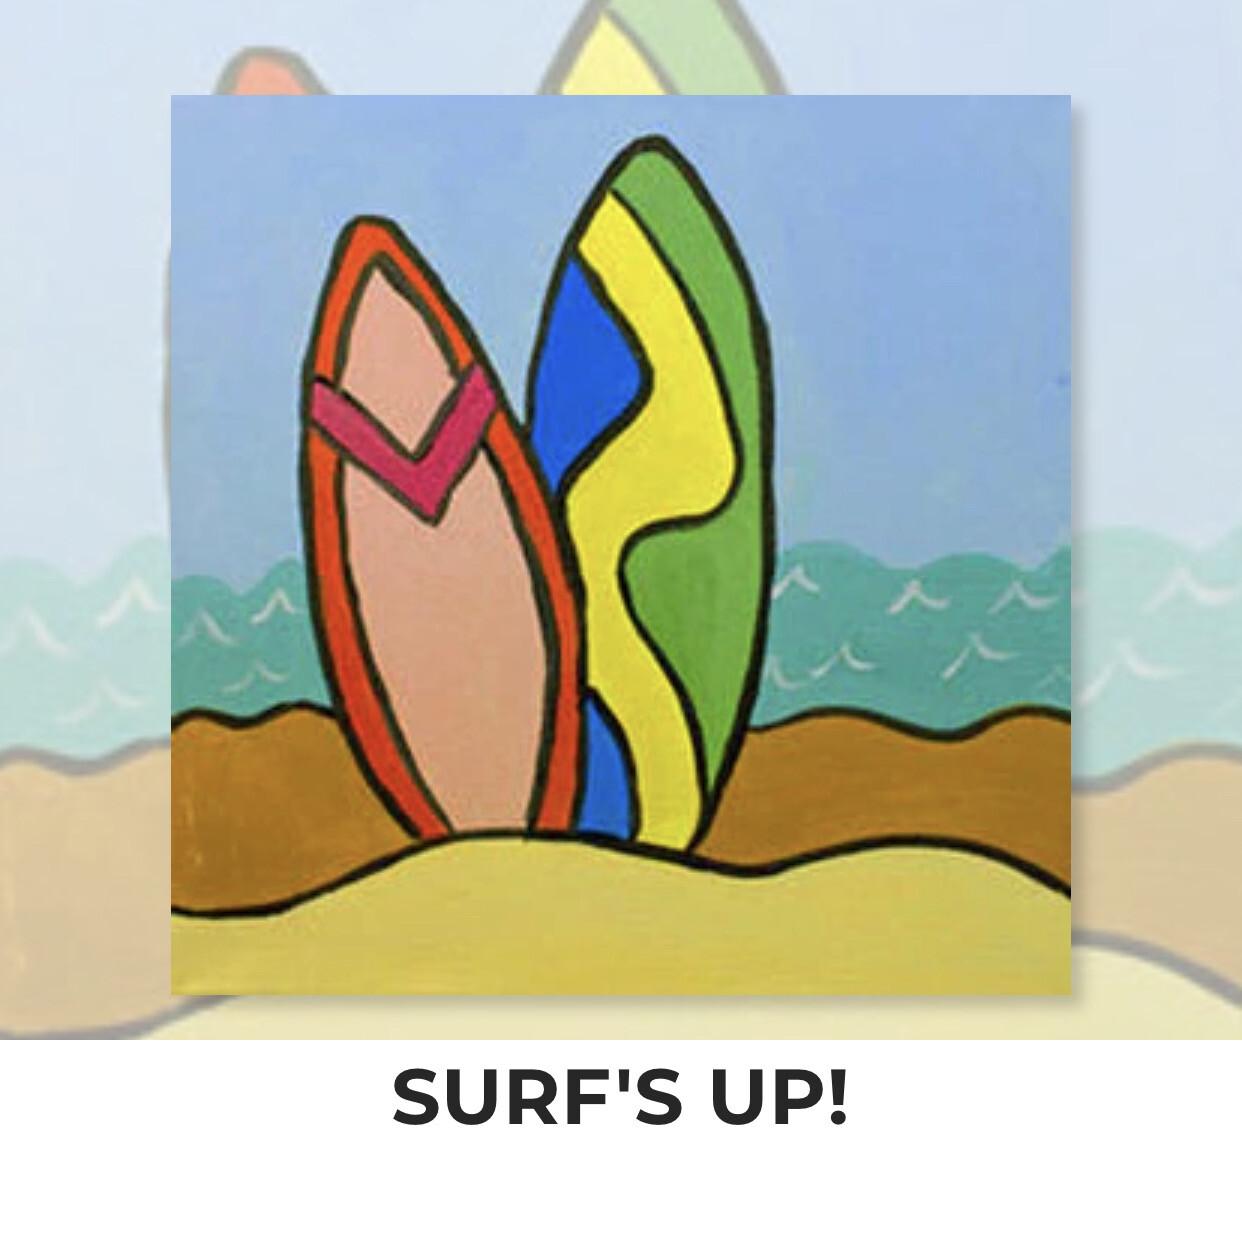 Surf's Up! Surfboards KIDS Acrylic Paint On Canvas DIY Art Kit